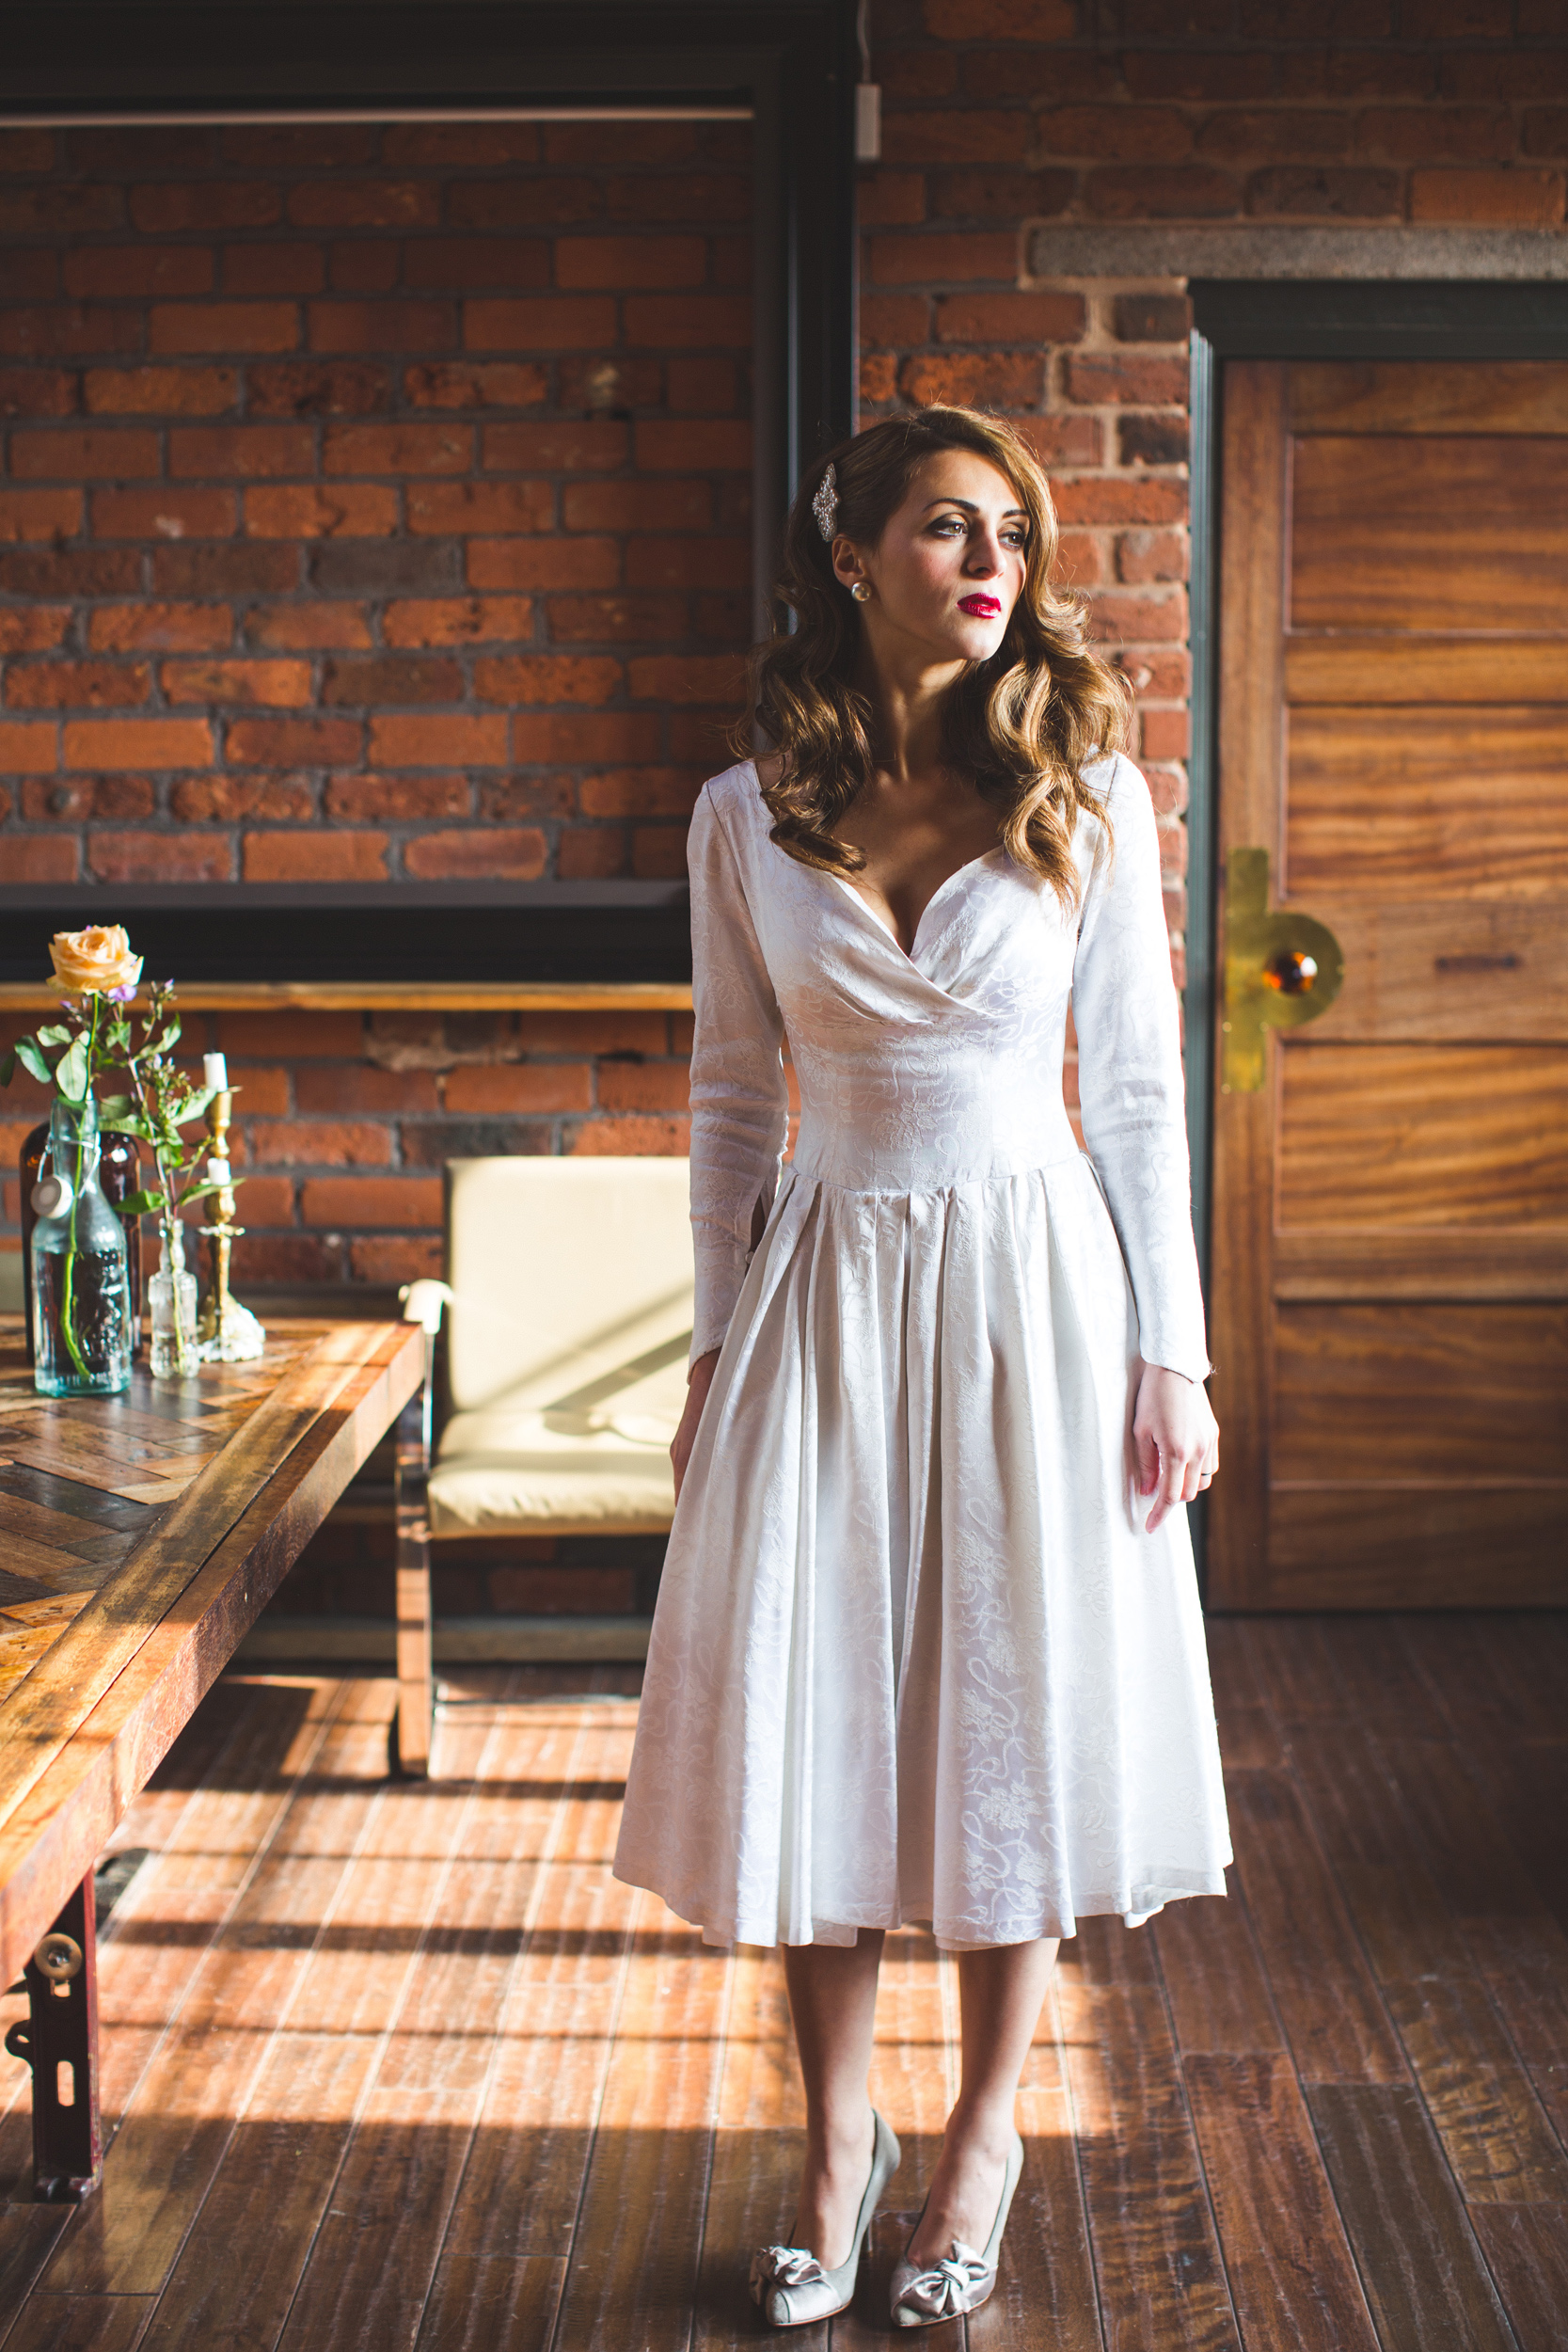 kate-beaumont-vintage-bridal-wedding-dresses-Sheffield-S6-18.jpg